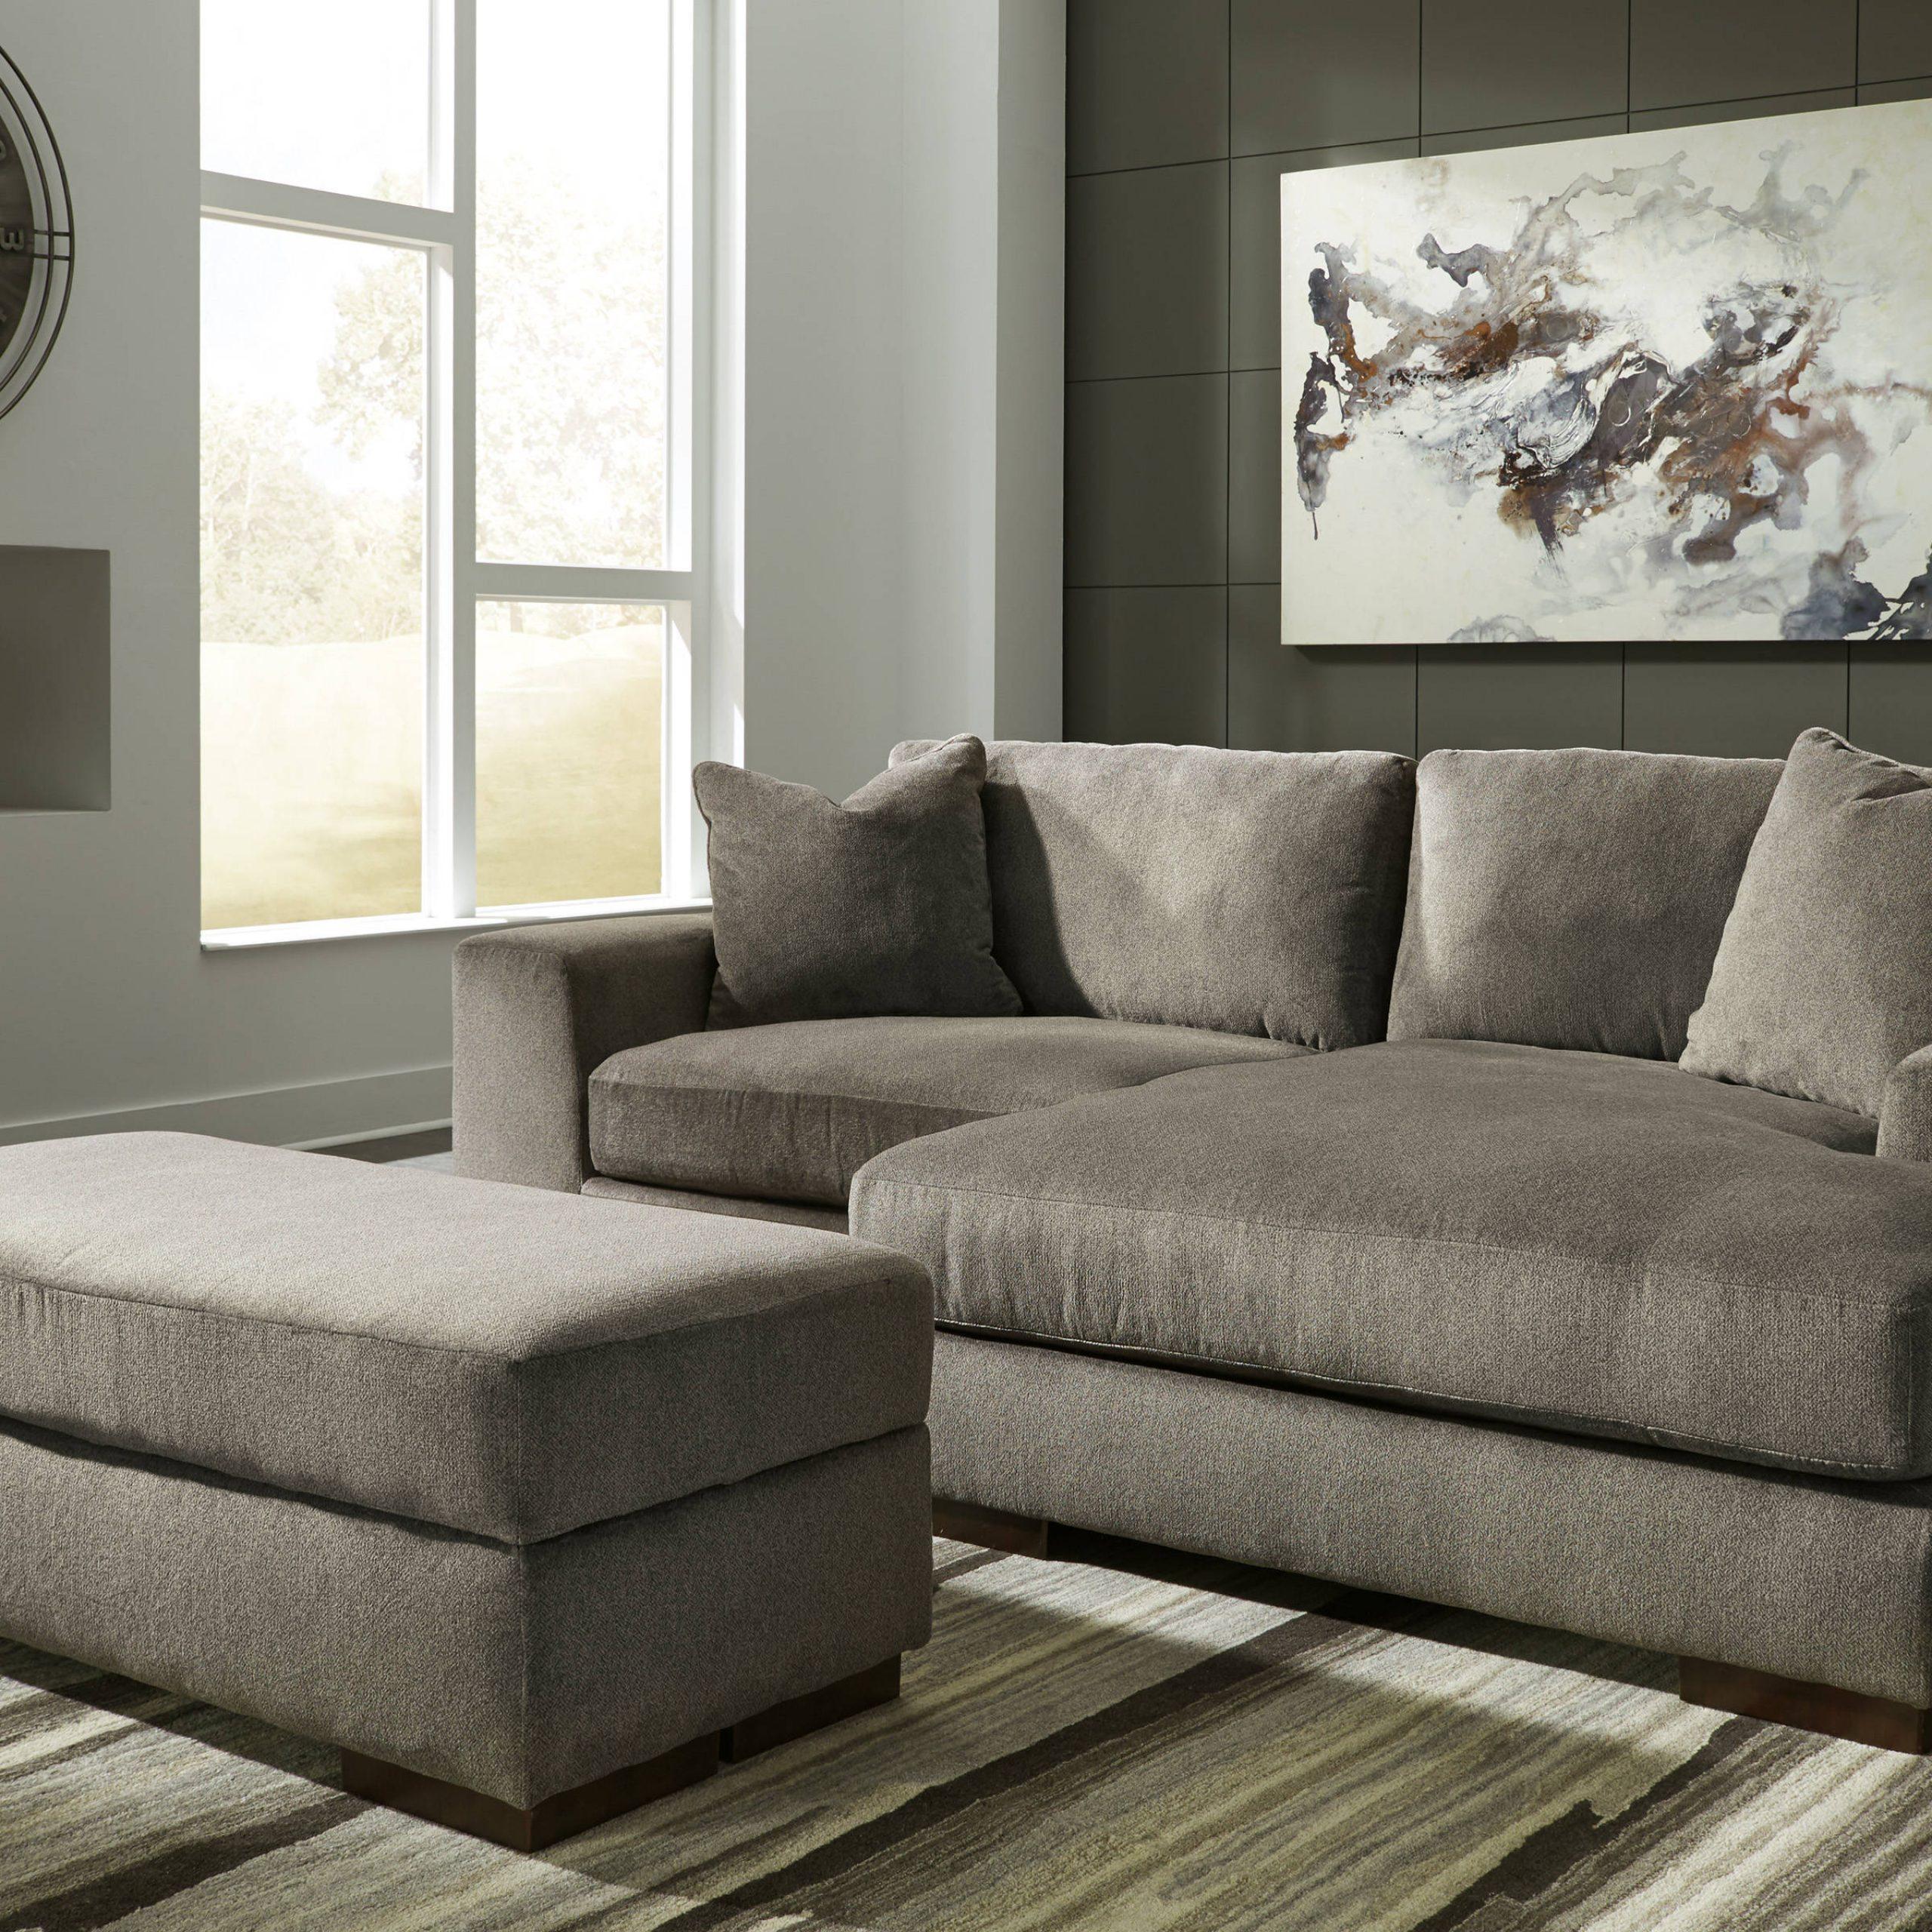 Ashley Furniture Manzani Raf Sectional With Storage Inside Sectional Sofas With Storage (View 7 of 15)